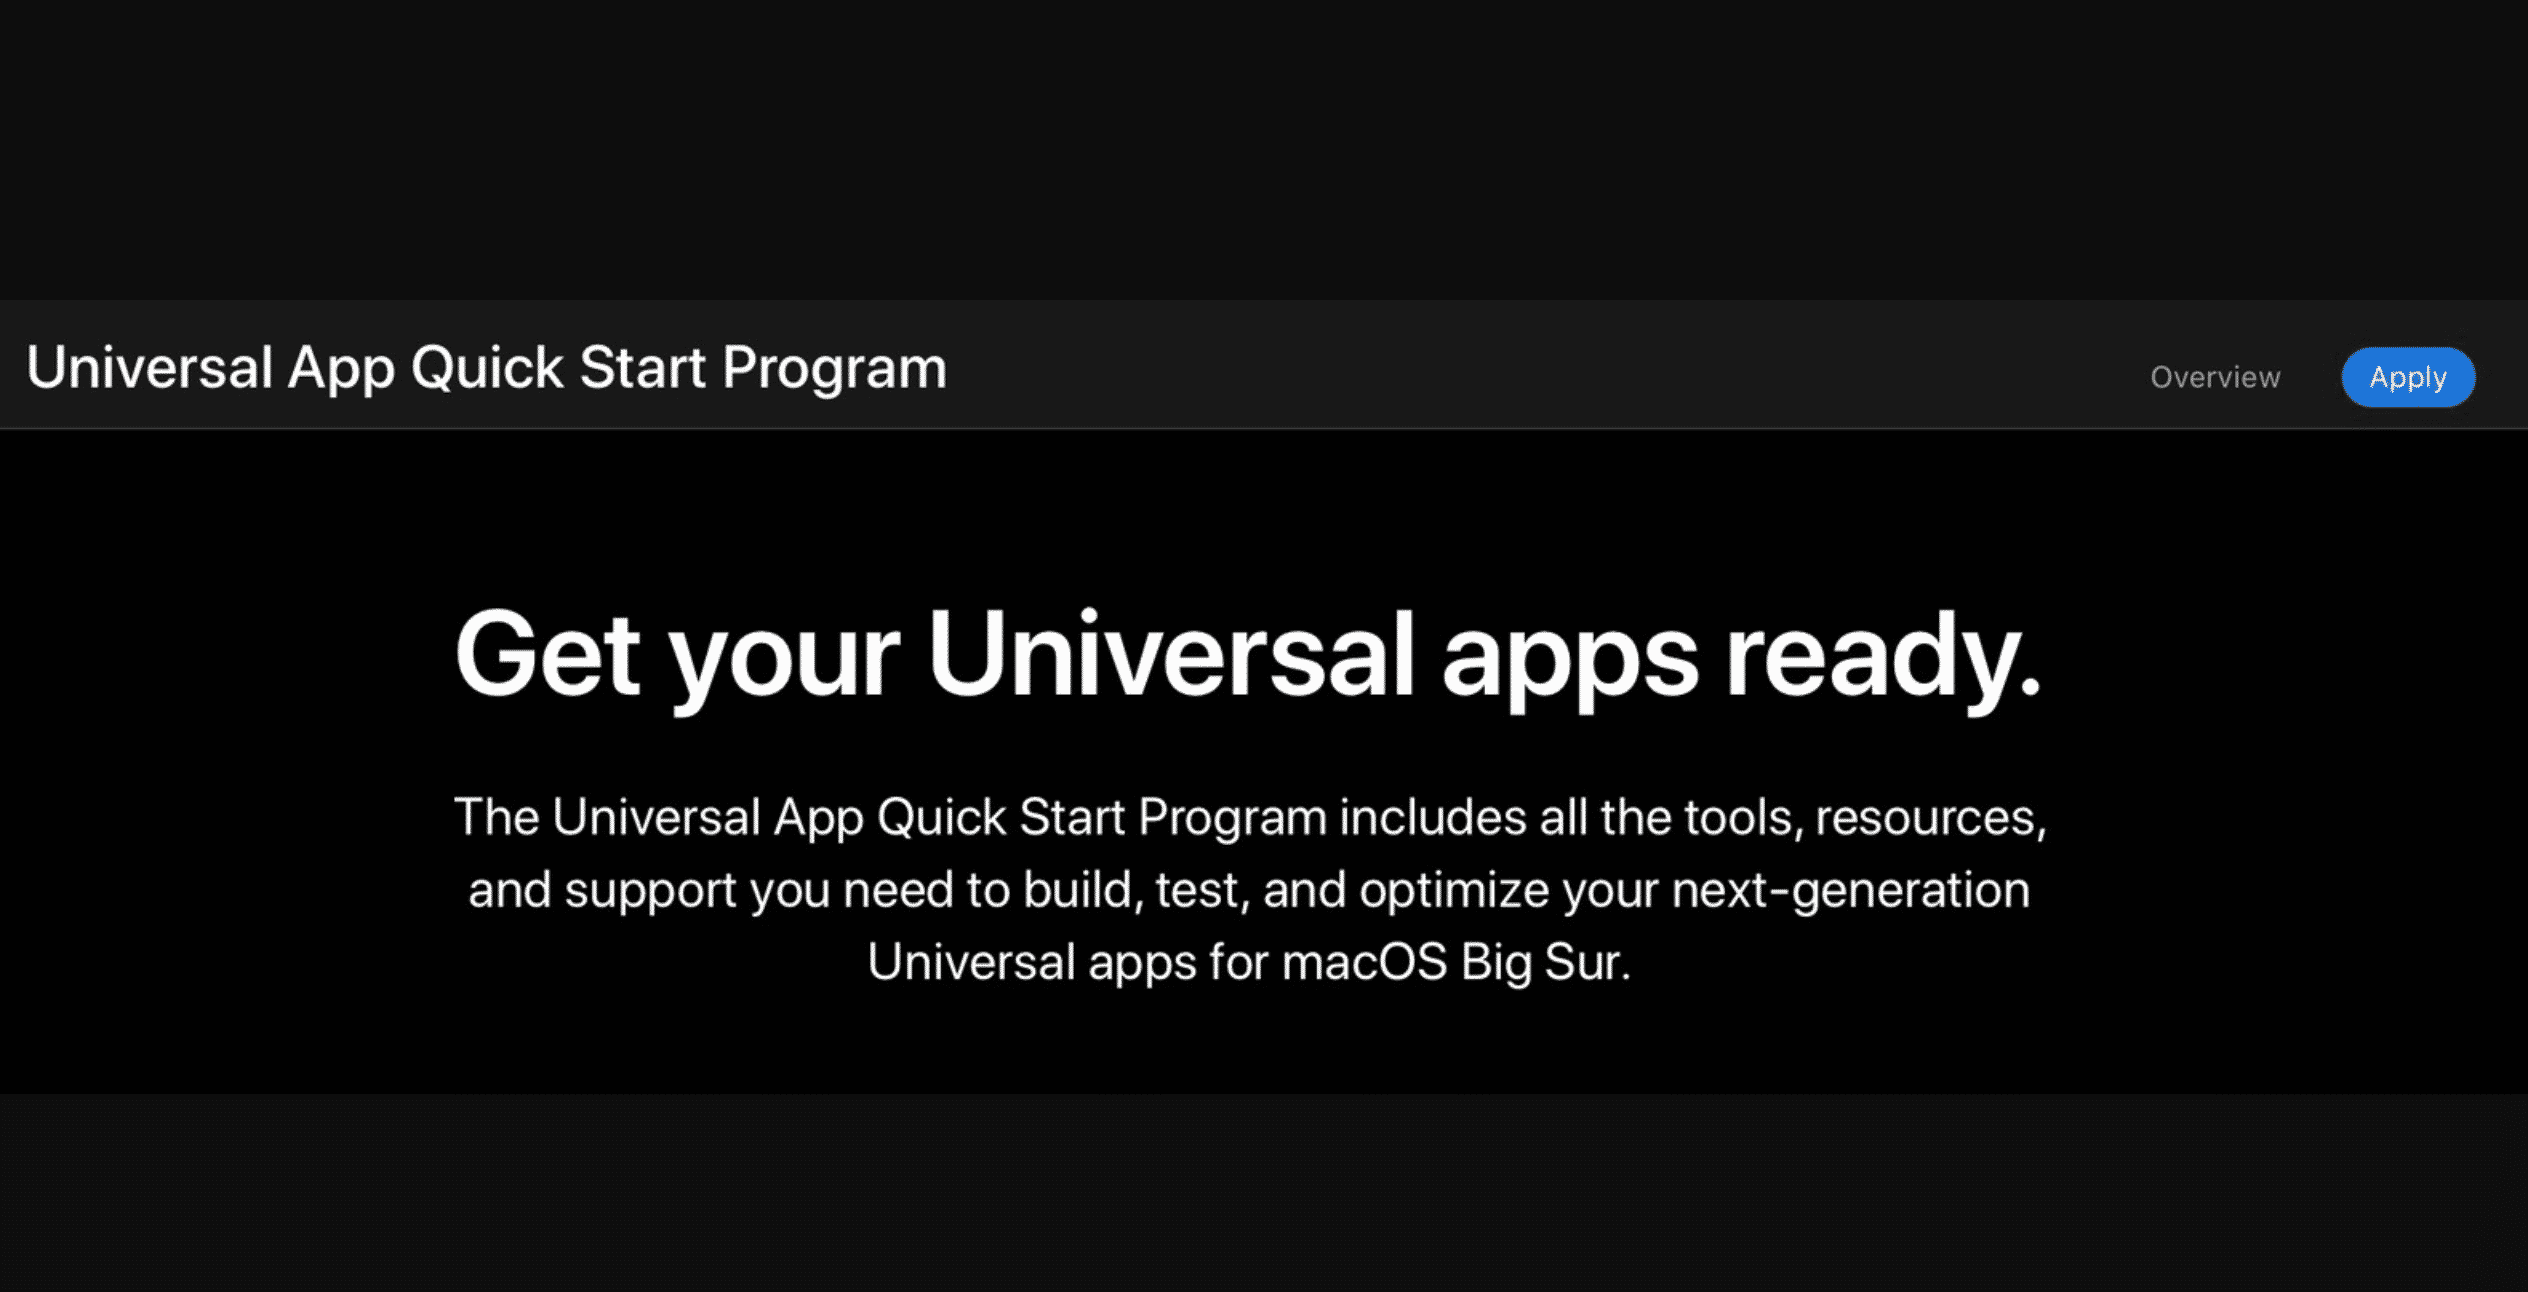 Universal App Quick Start Program